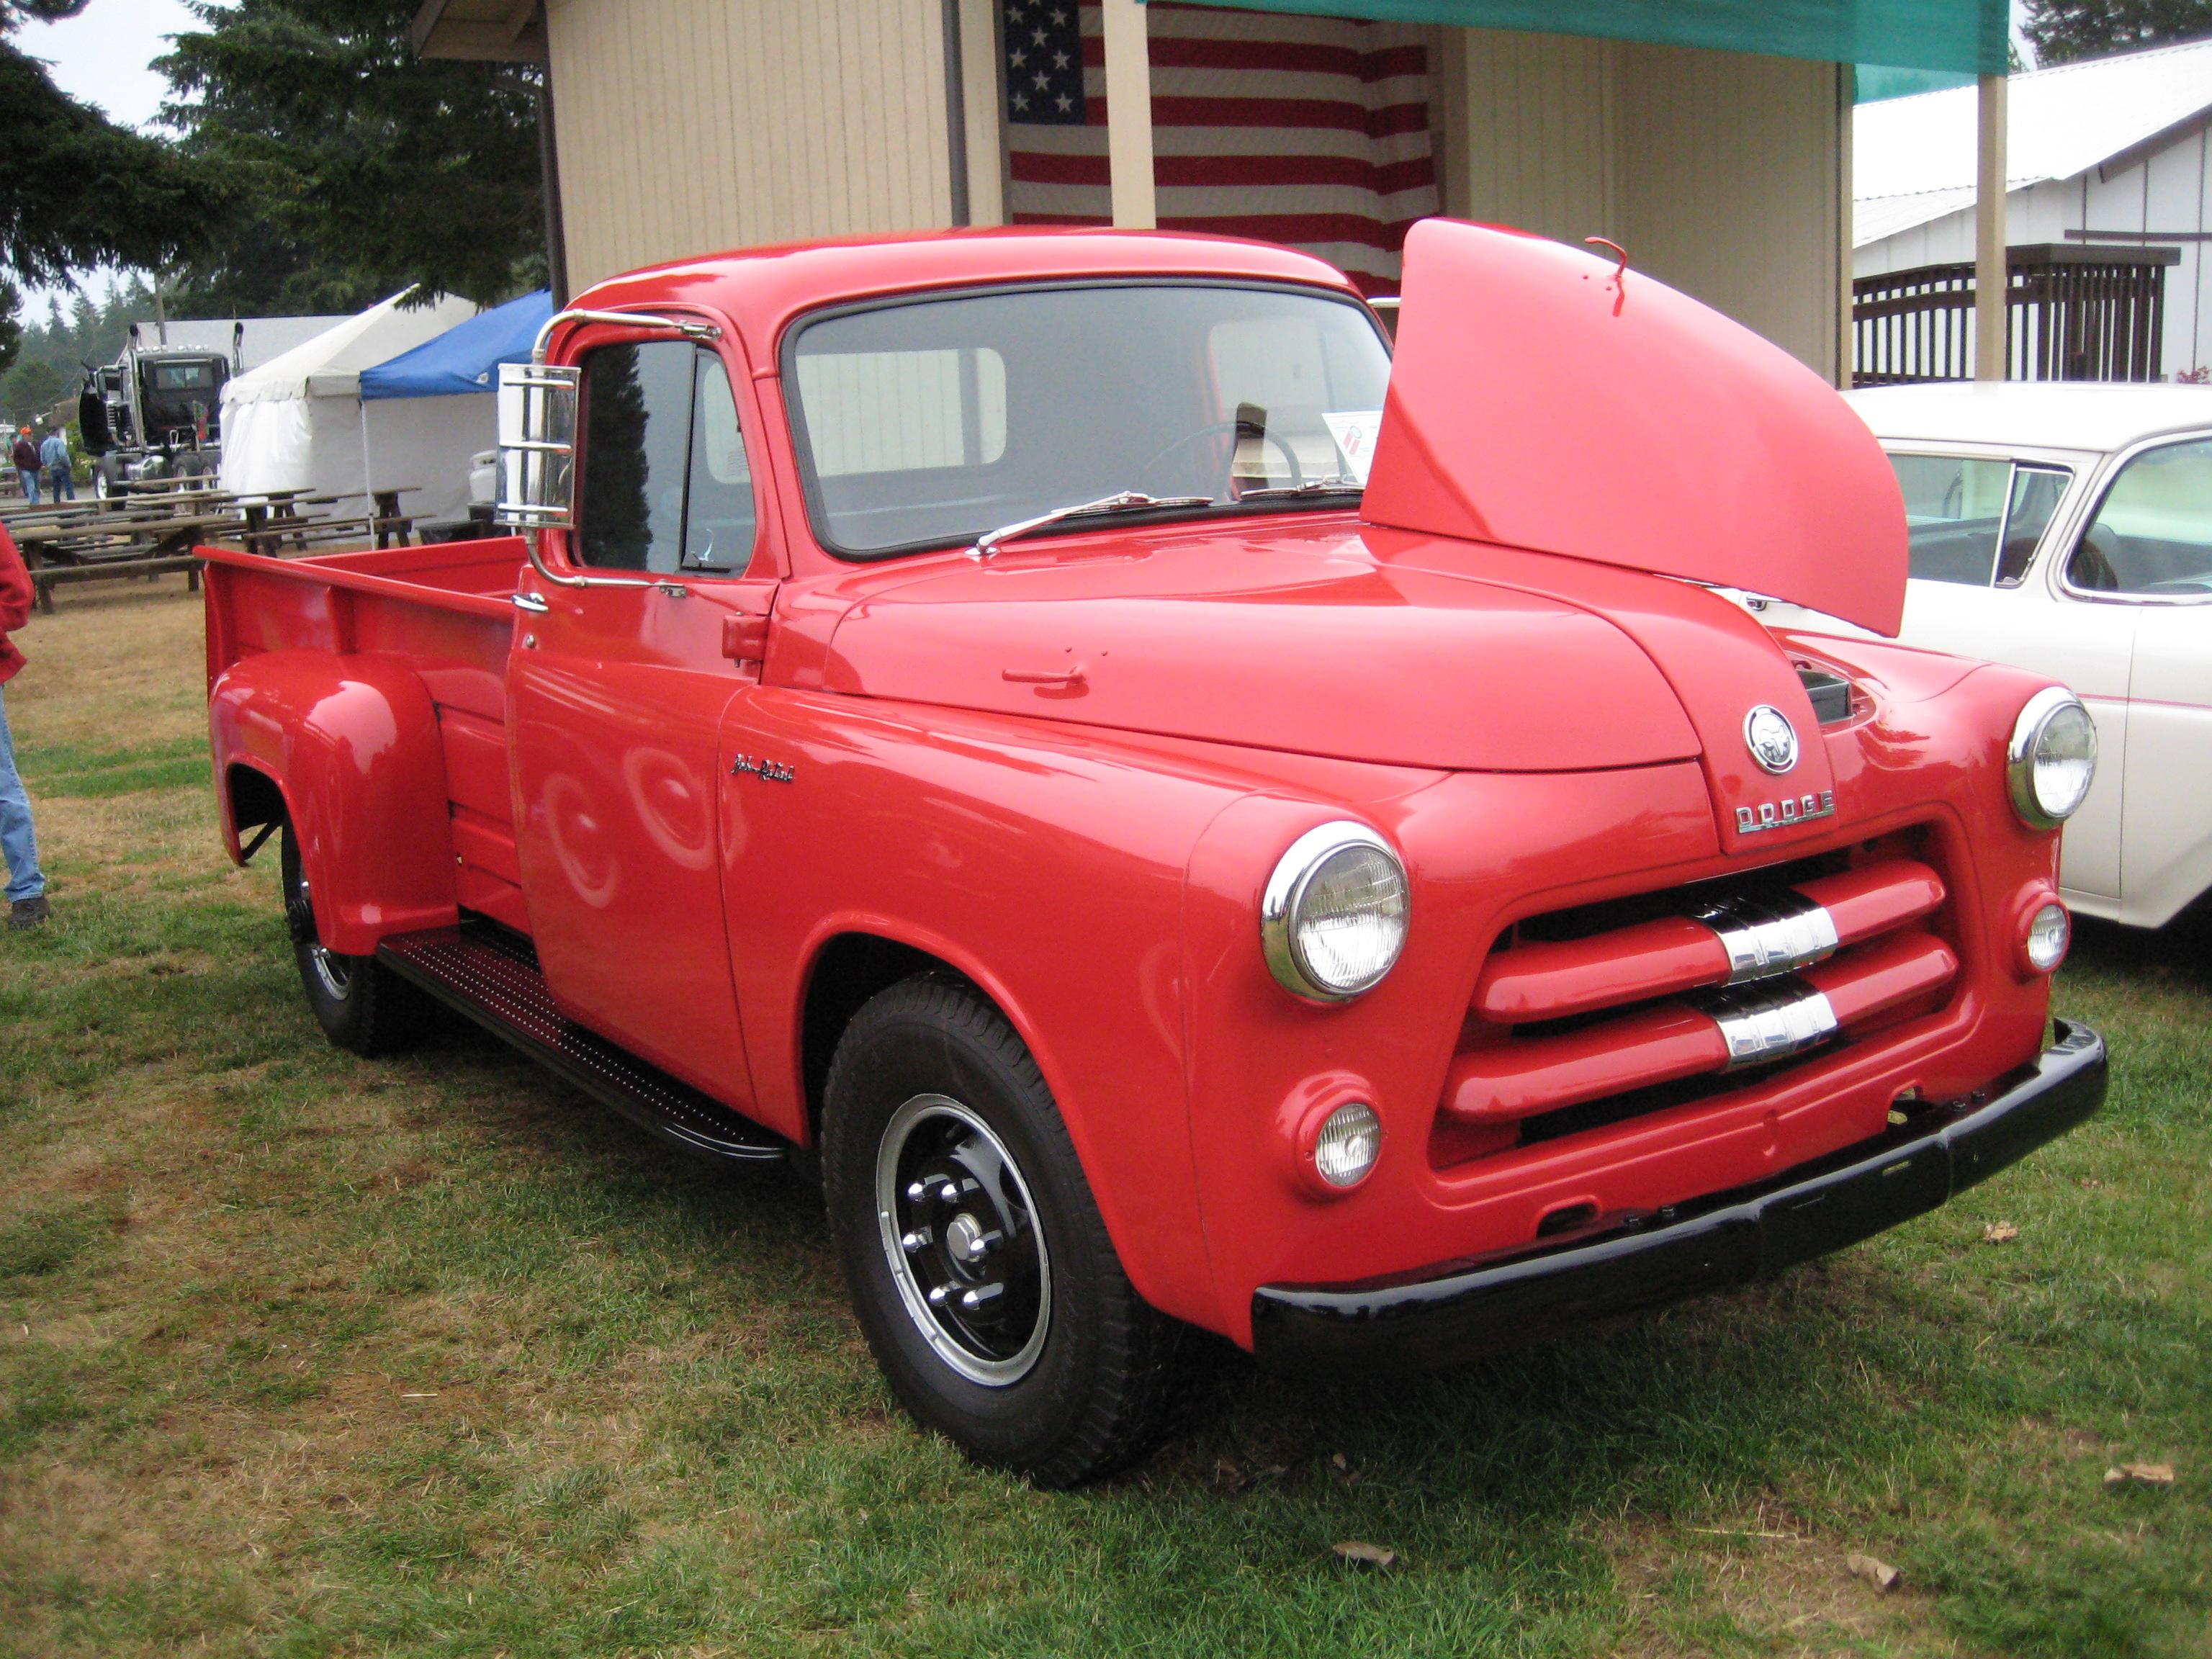 File:1954 Dodge C-Series Pickup 01.jpg - Wikimedia Commons